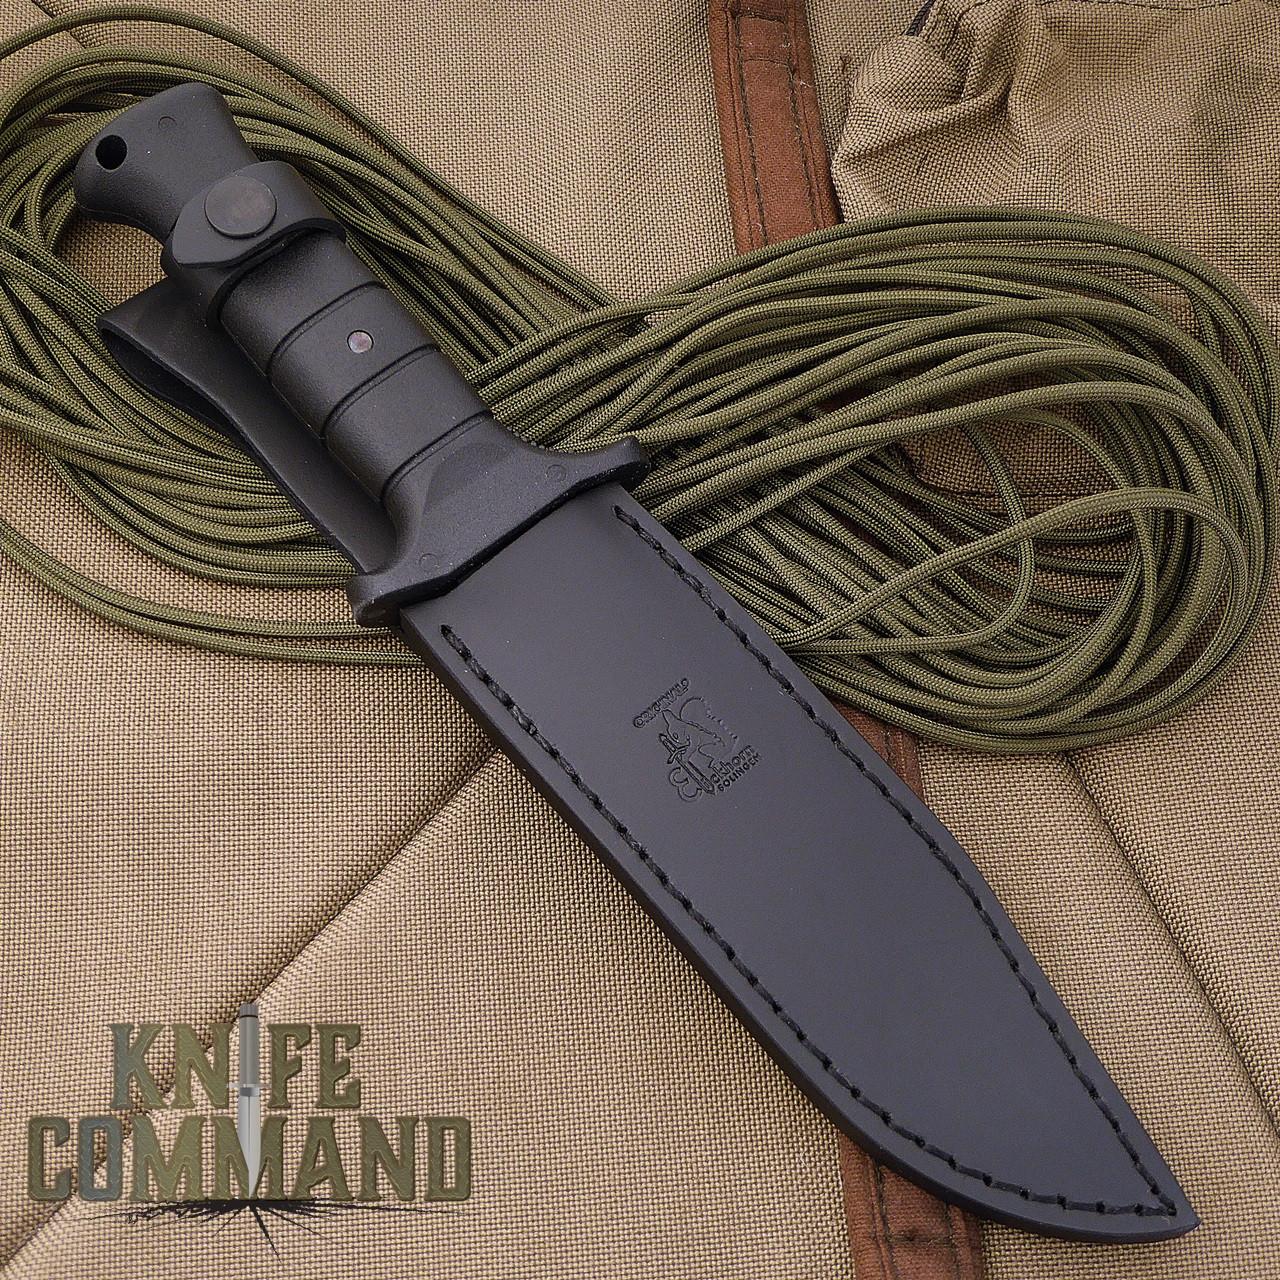 Eickhorn Solingen Wolverine German Expedition Knife.  Black leather Eickhorn sheath.